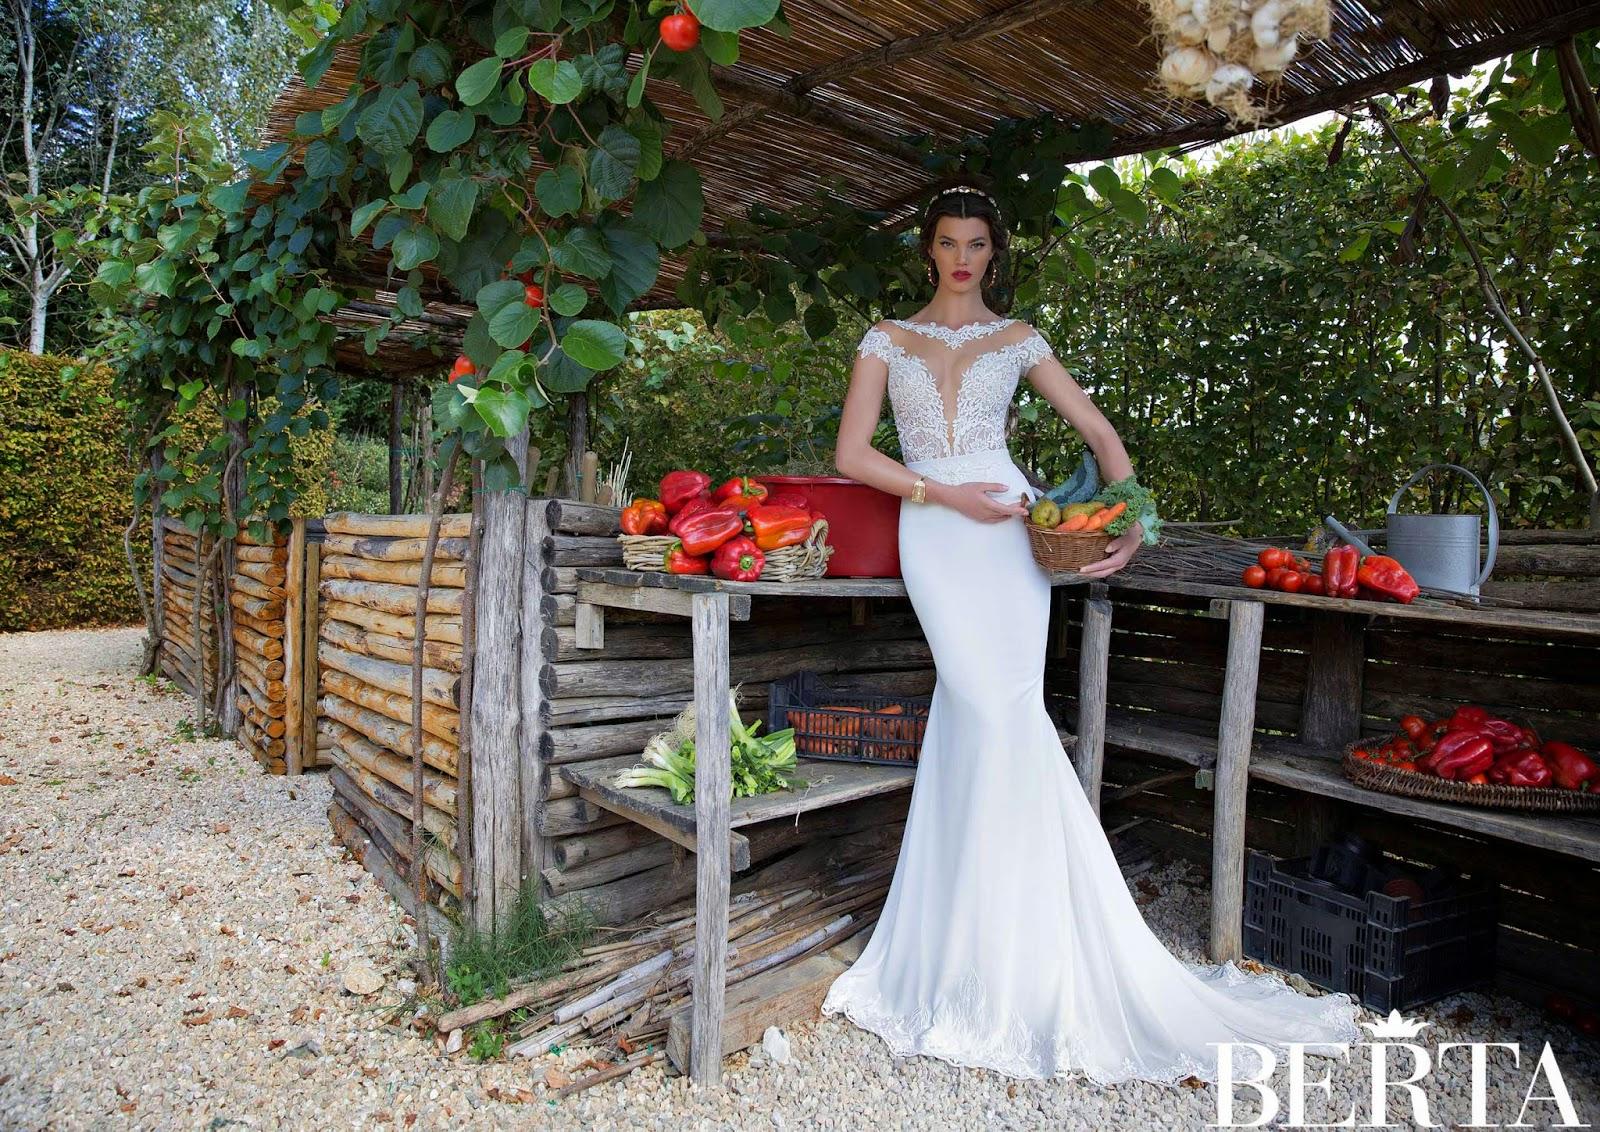 Vestidos de Berta Bridal por fin en España.